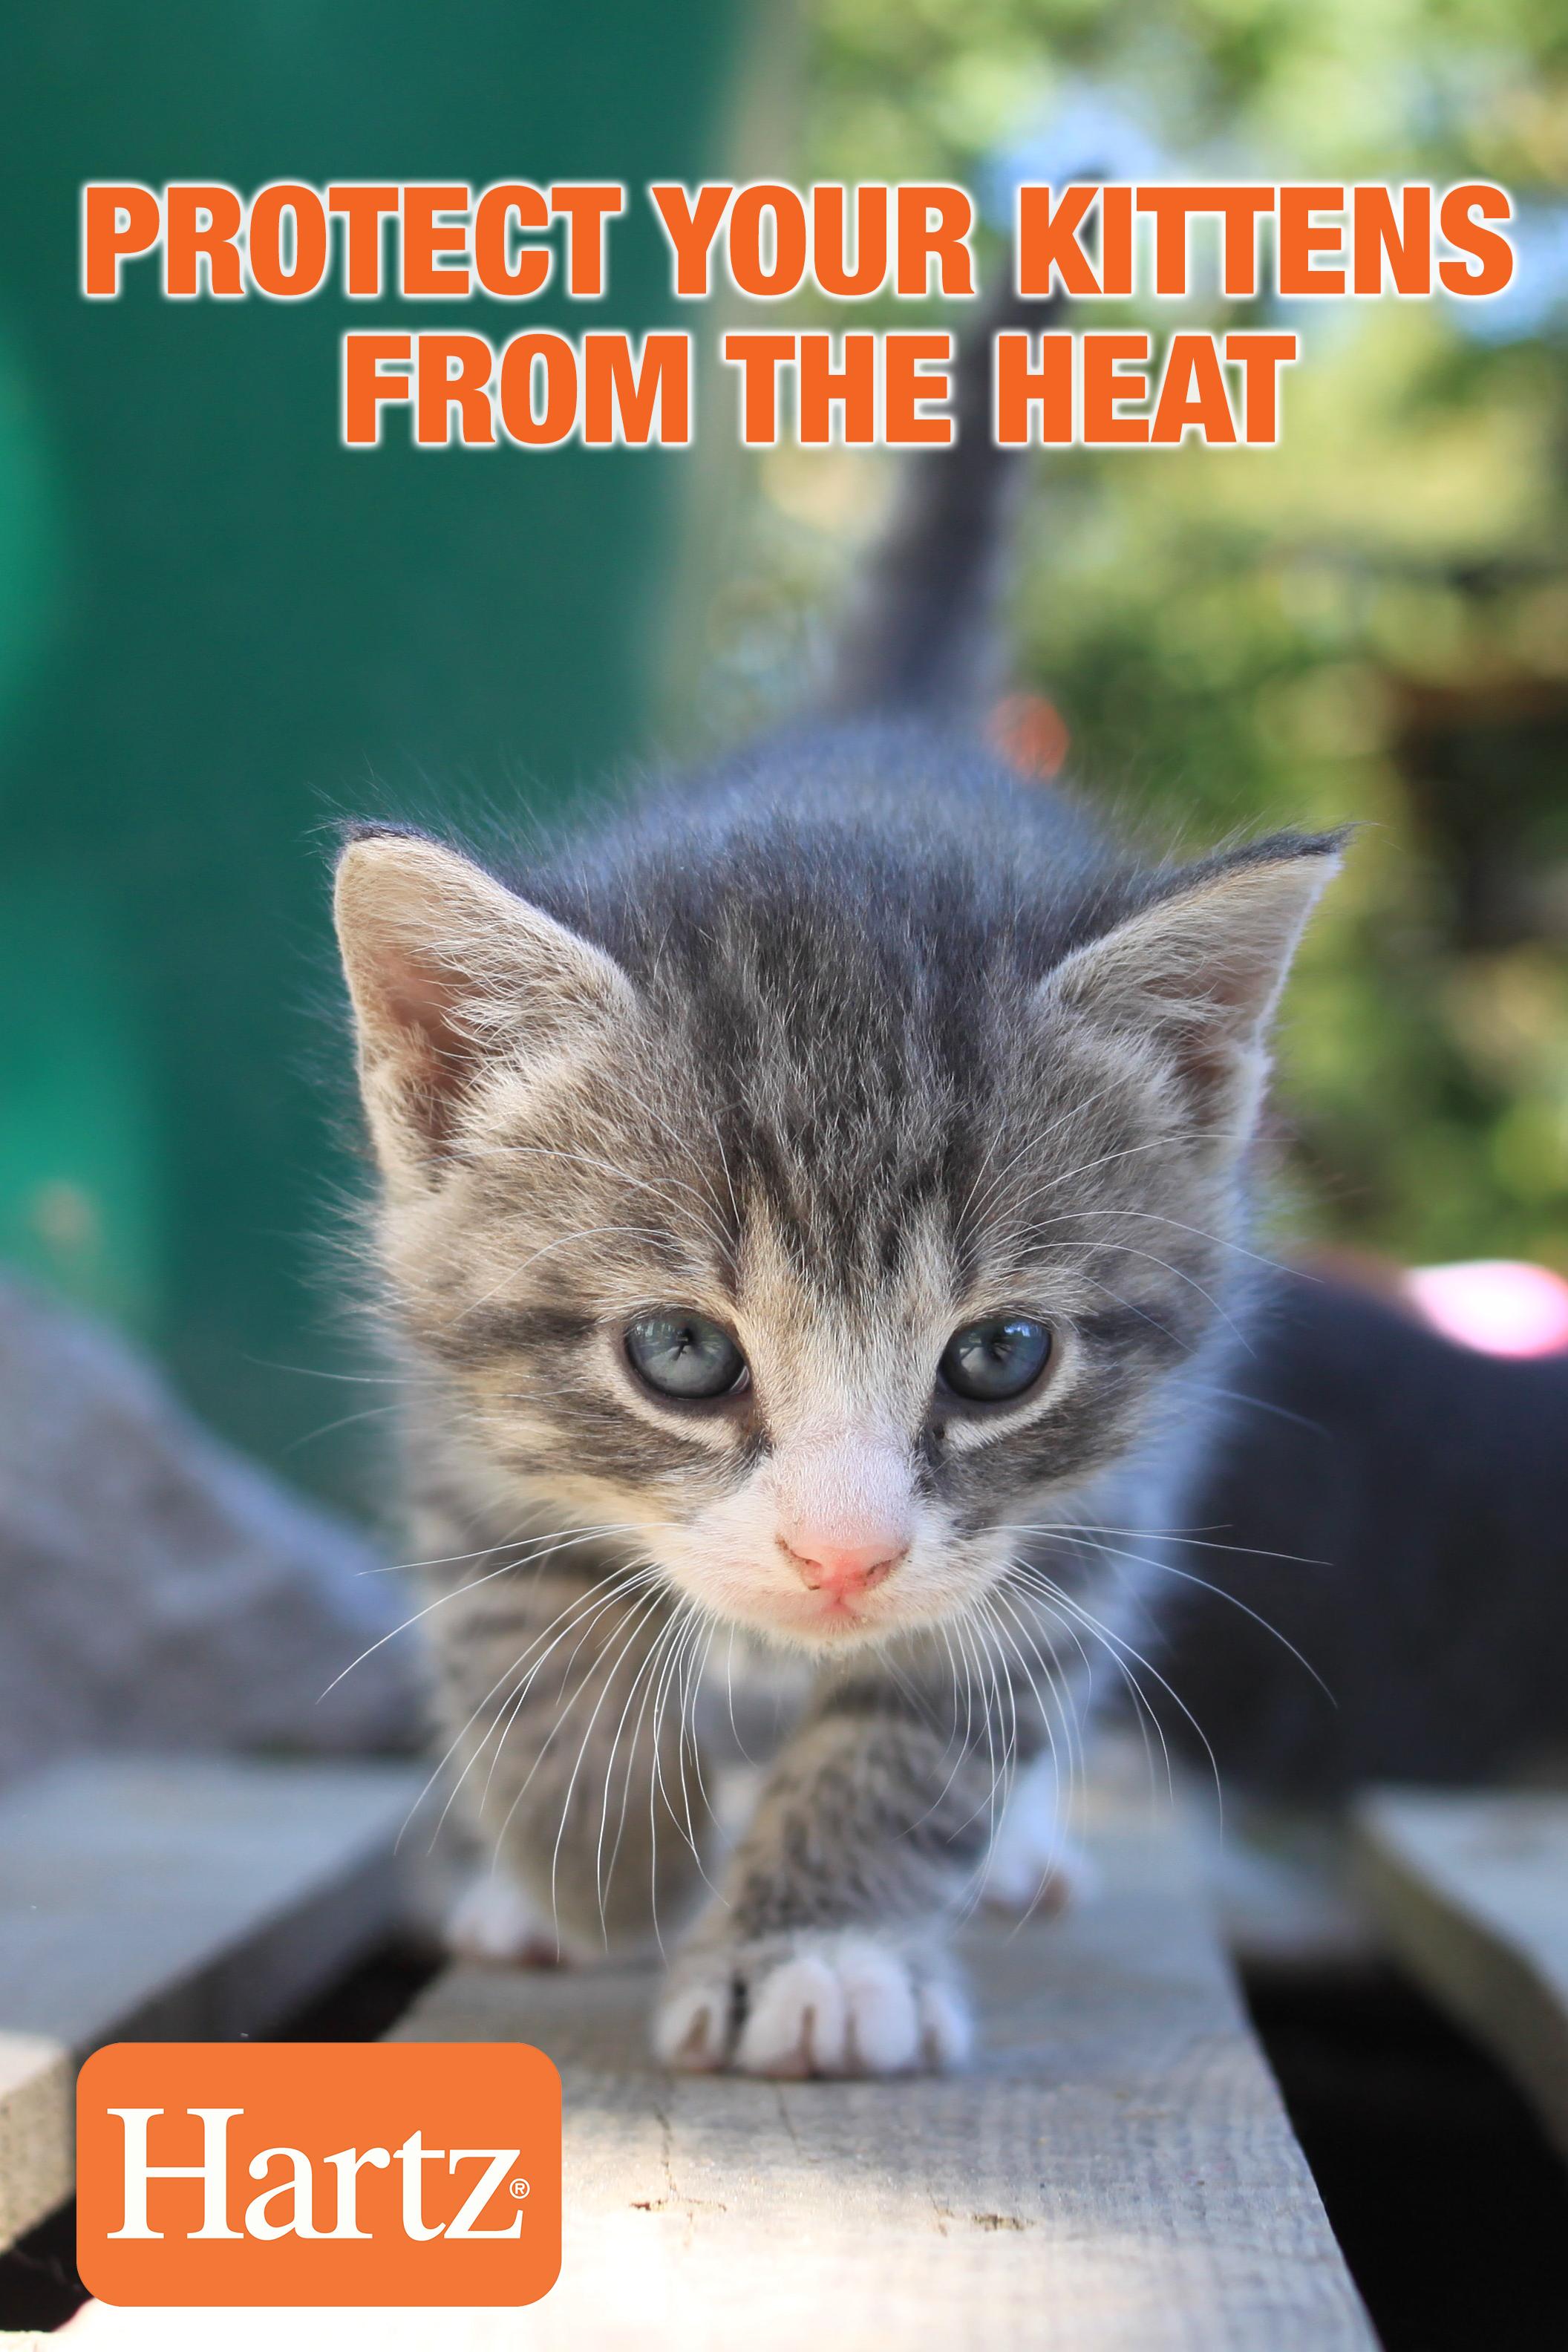 Protect Your Kittens From The Heat In 2020 Kitten Wallpaper Little Kittens Kitten